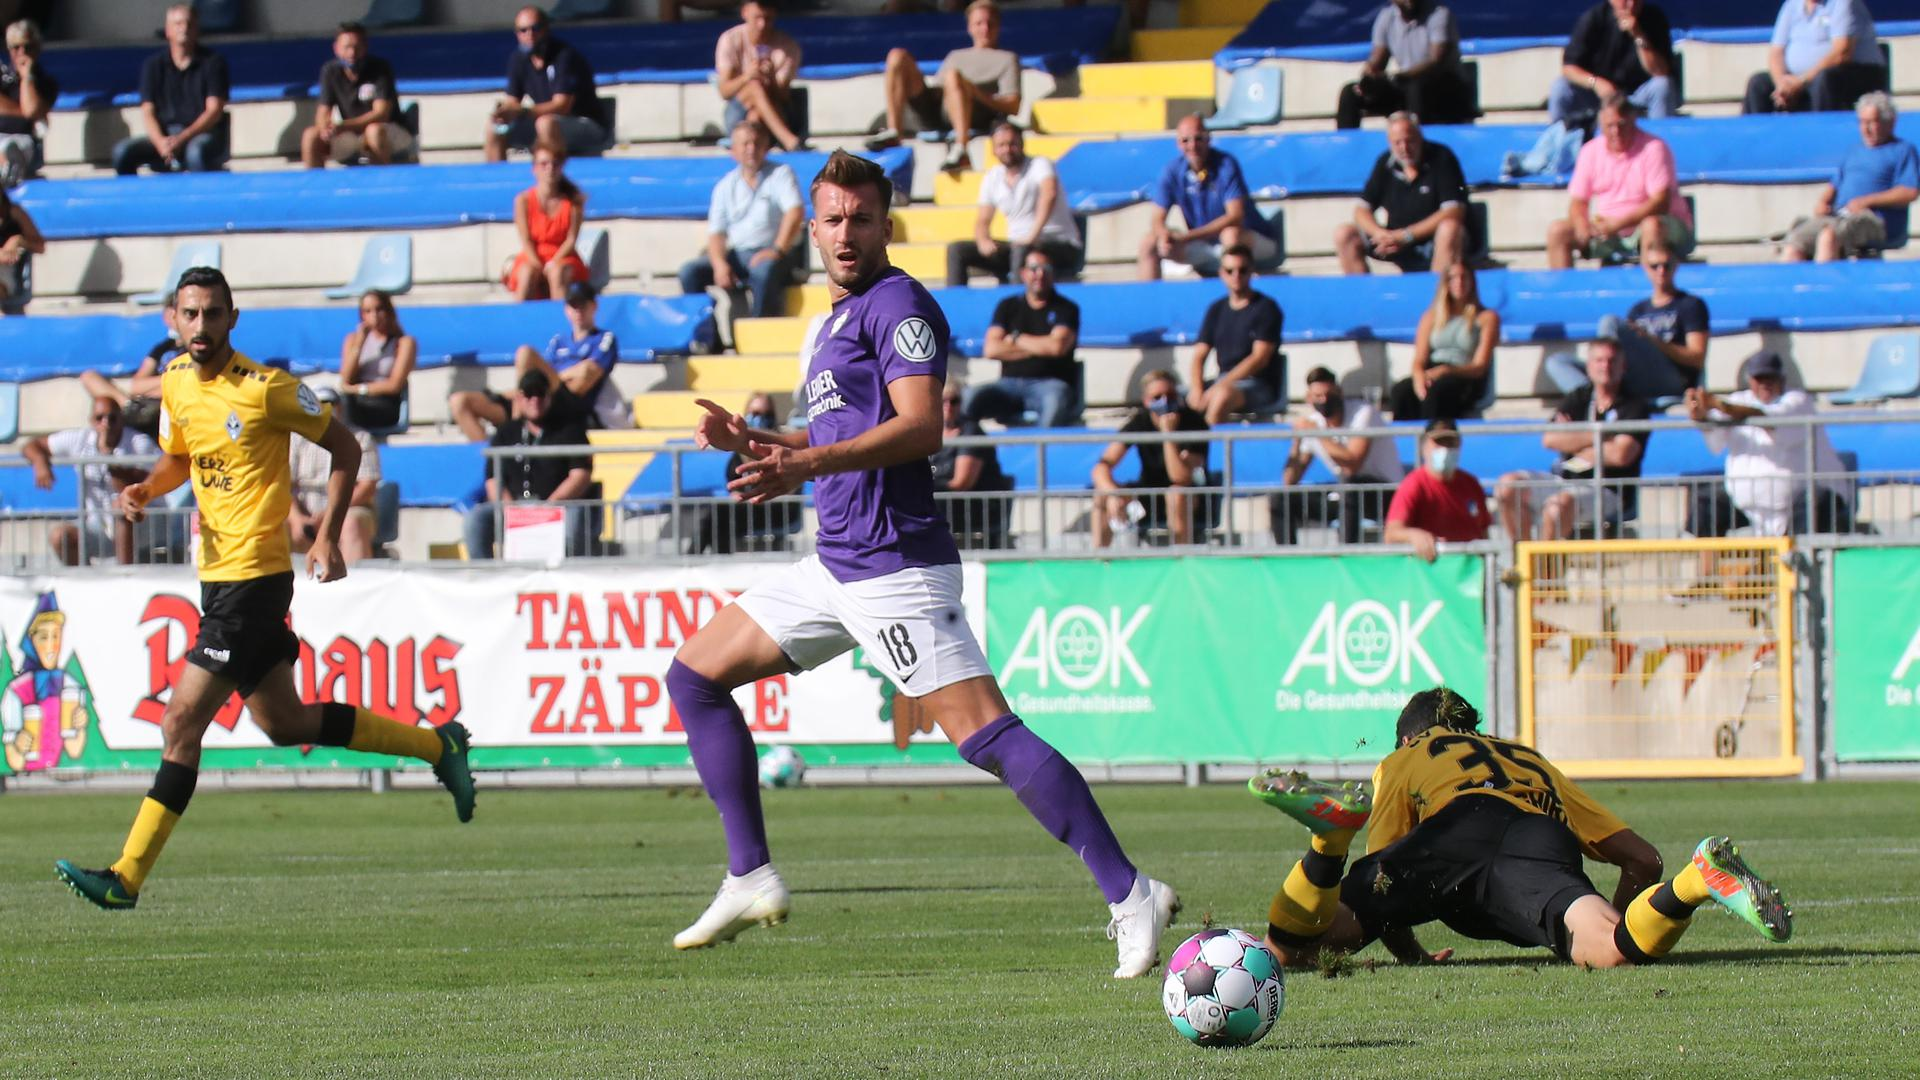 Hecht-Zirpel Niklas FCN lila_Saghiri Hamza SVW gelb2